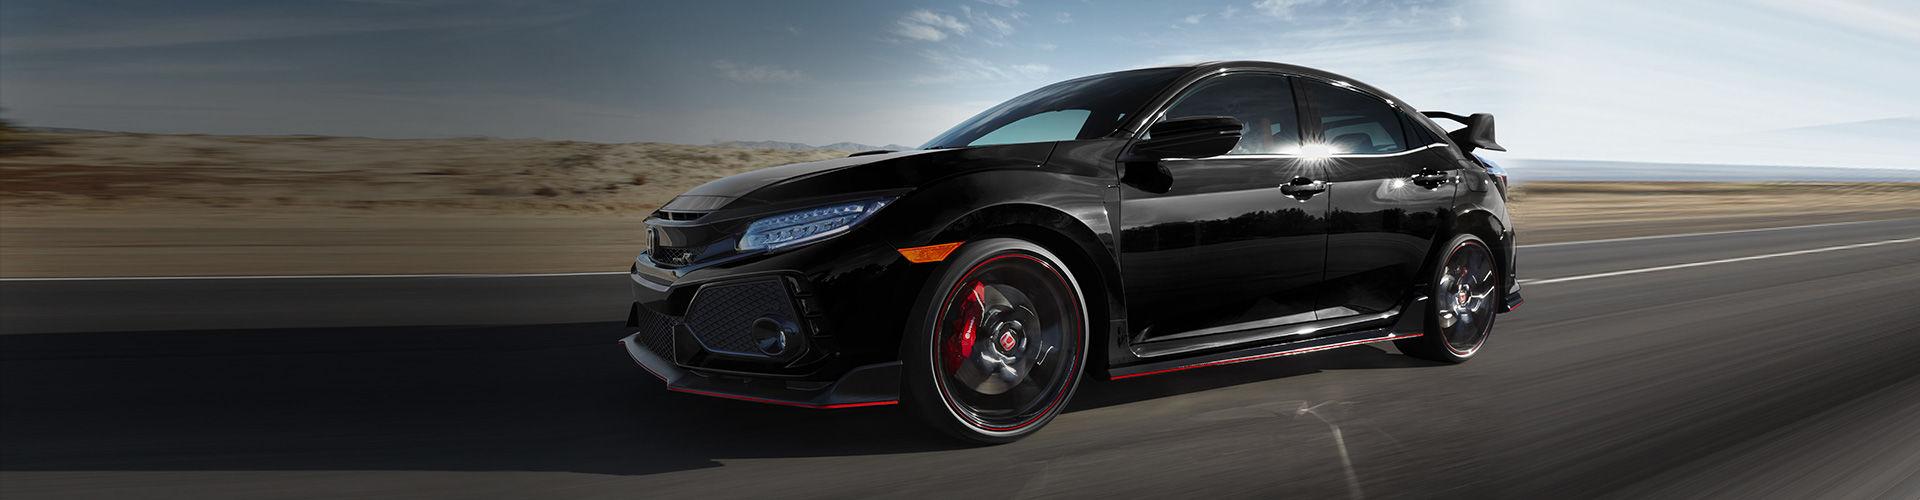 Type R Civic